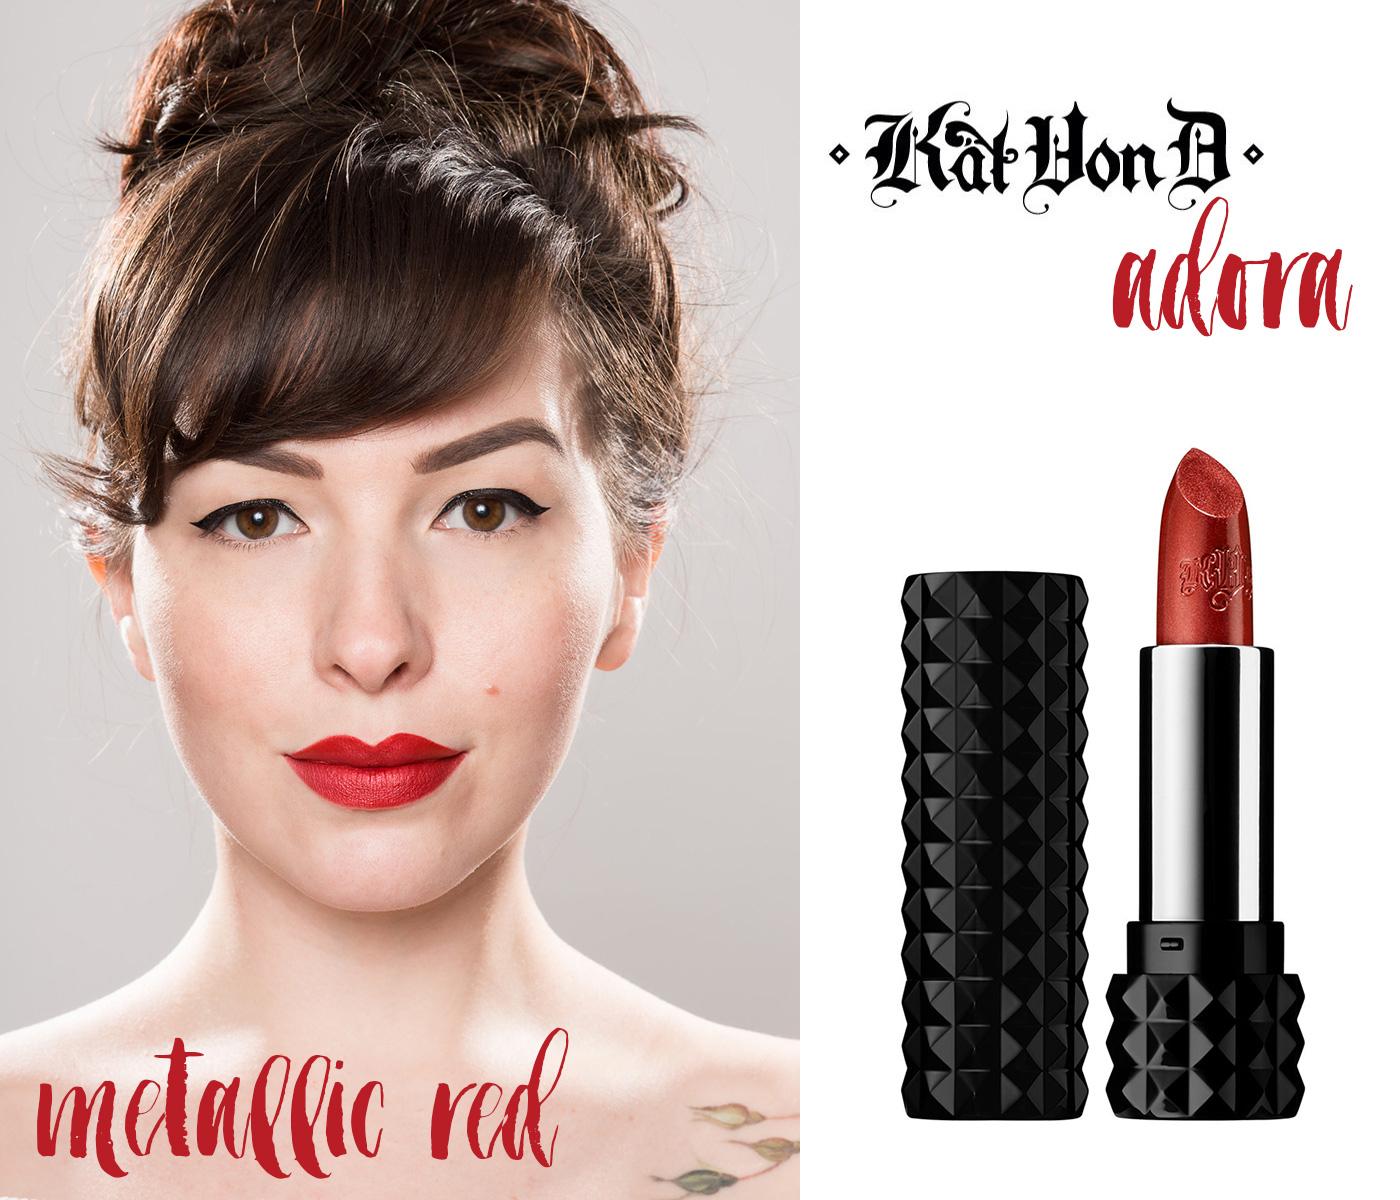 finding the perfect red lipstick: kat von d adora metallic red lipstick